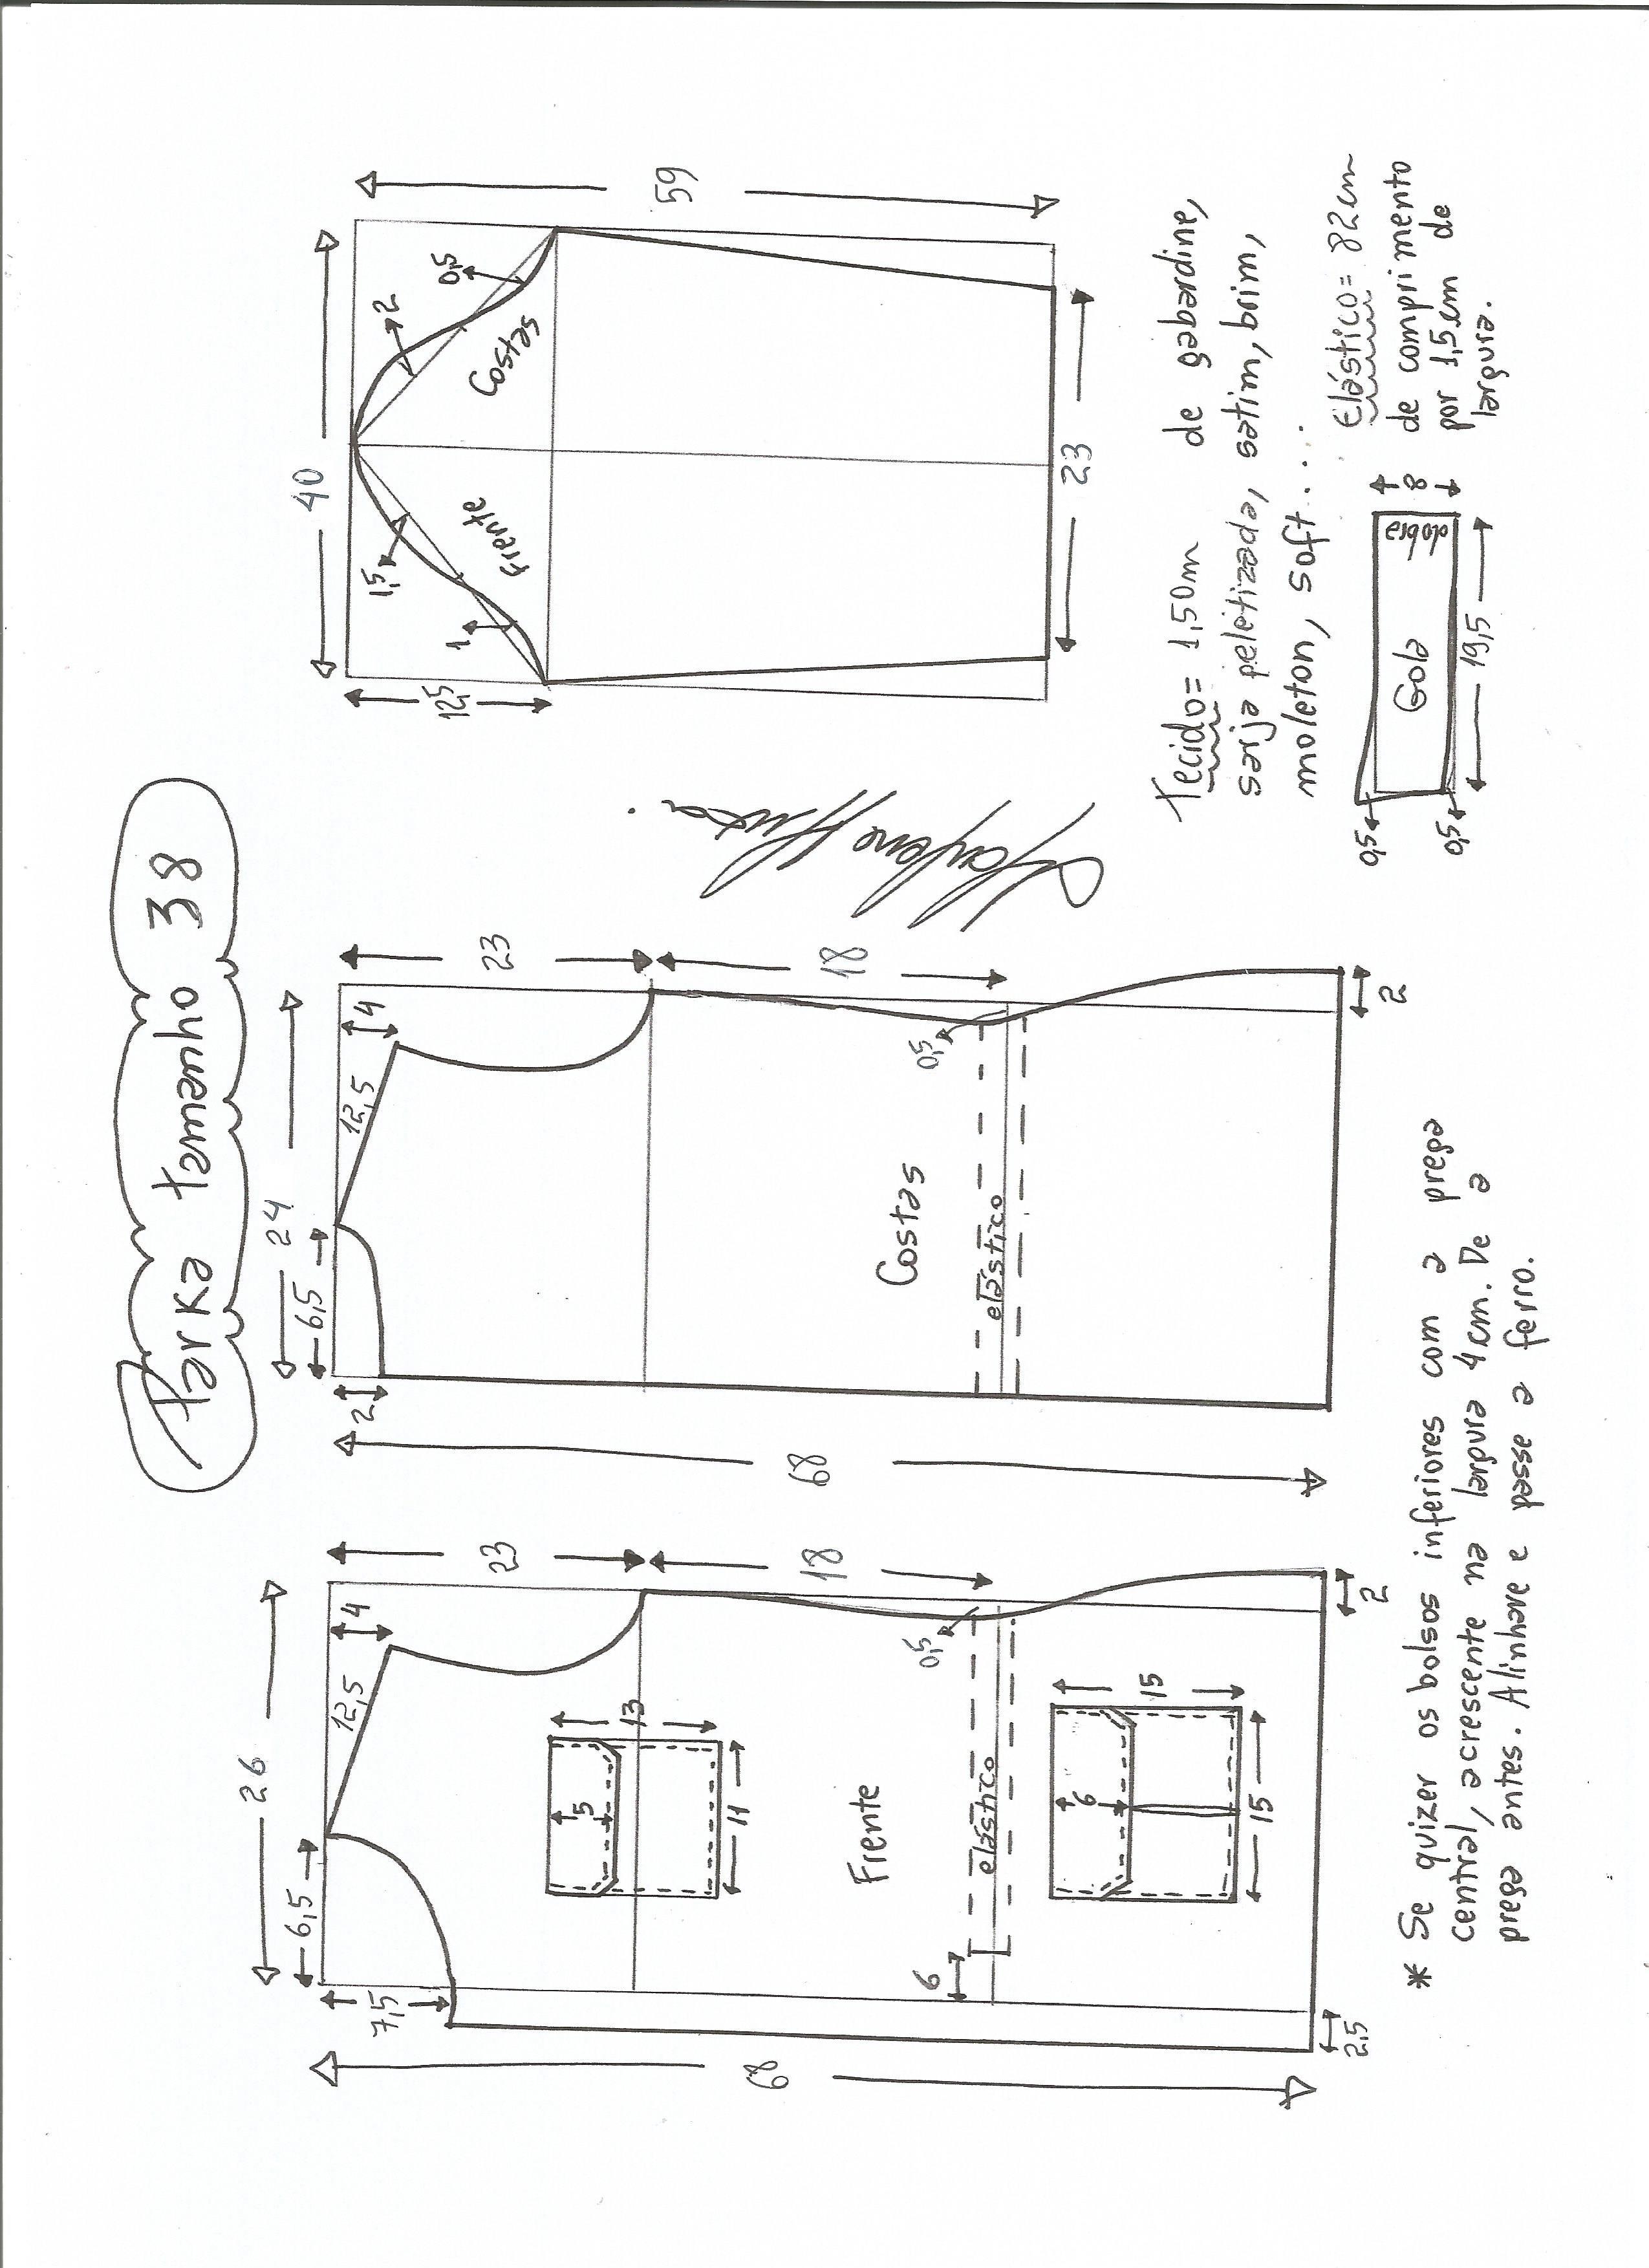 Parka | Cardigan pattern | Pinterest | Costura, Patrones y Molde